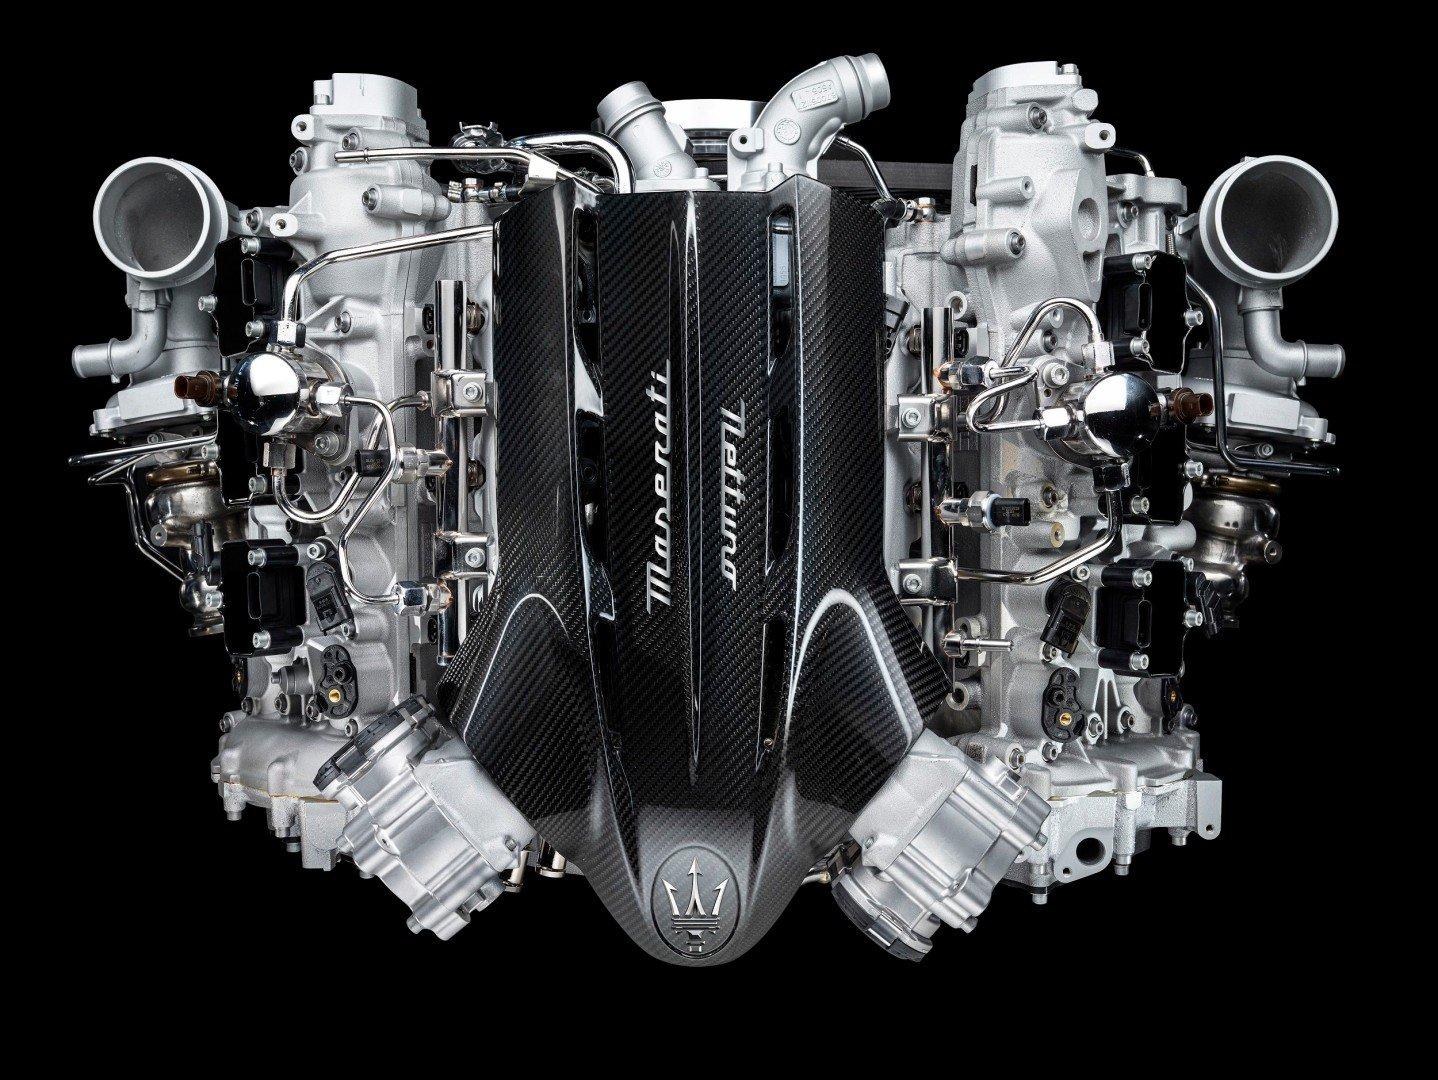 maserati nettuno v6 motor (8)